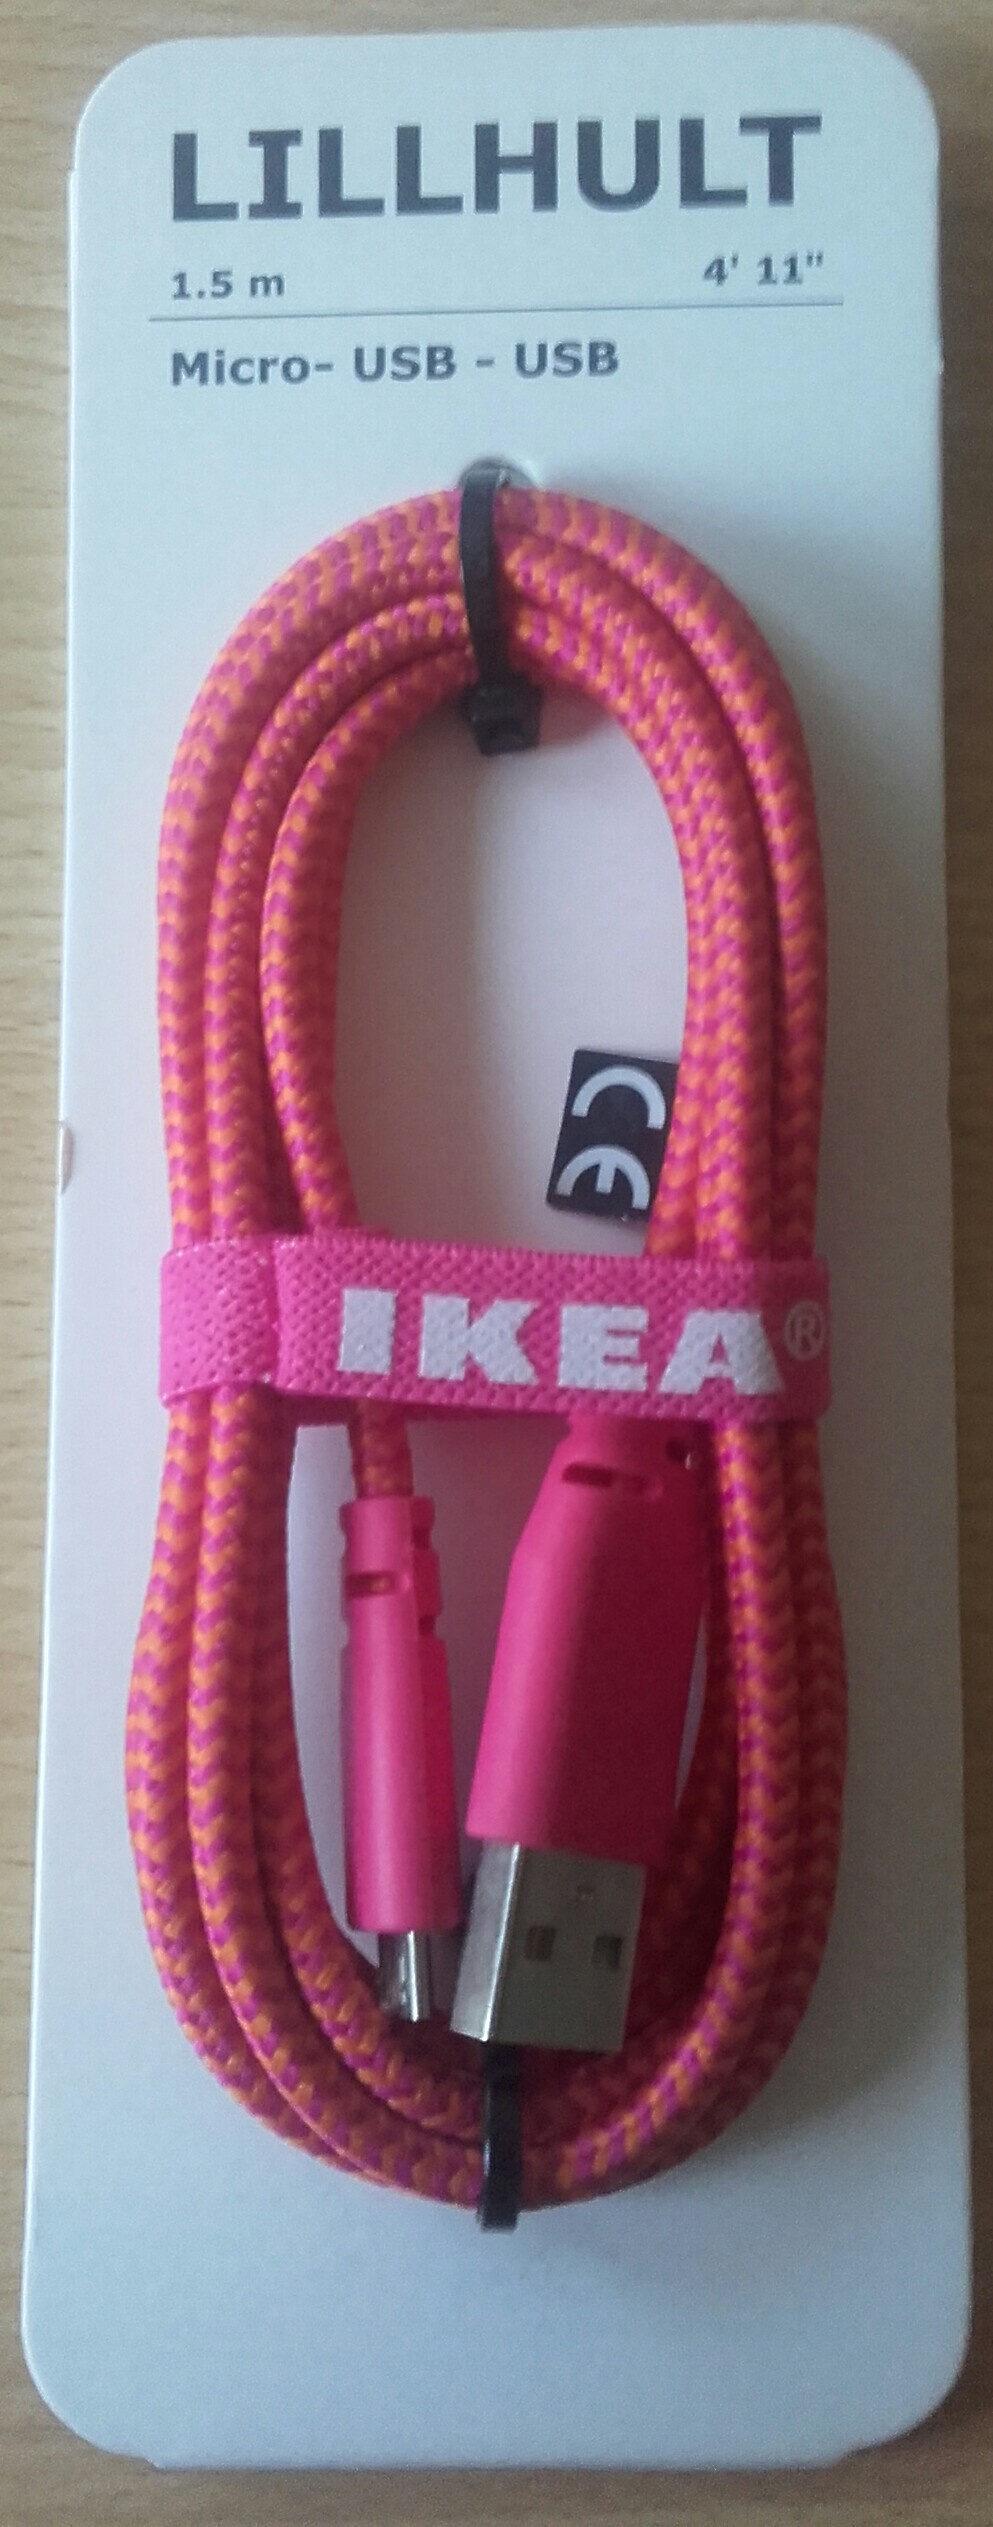 Cable Micro USB - USB - Produit - fr